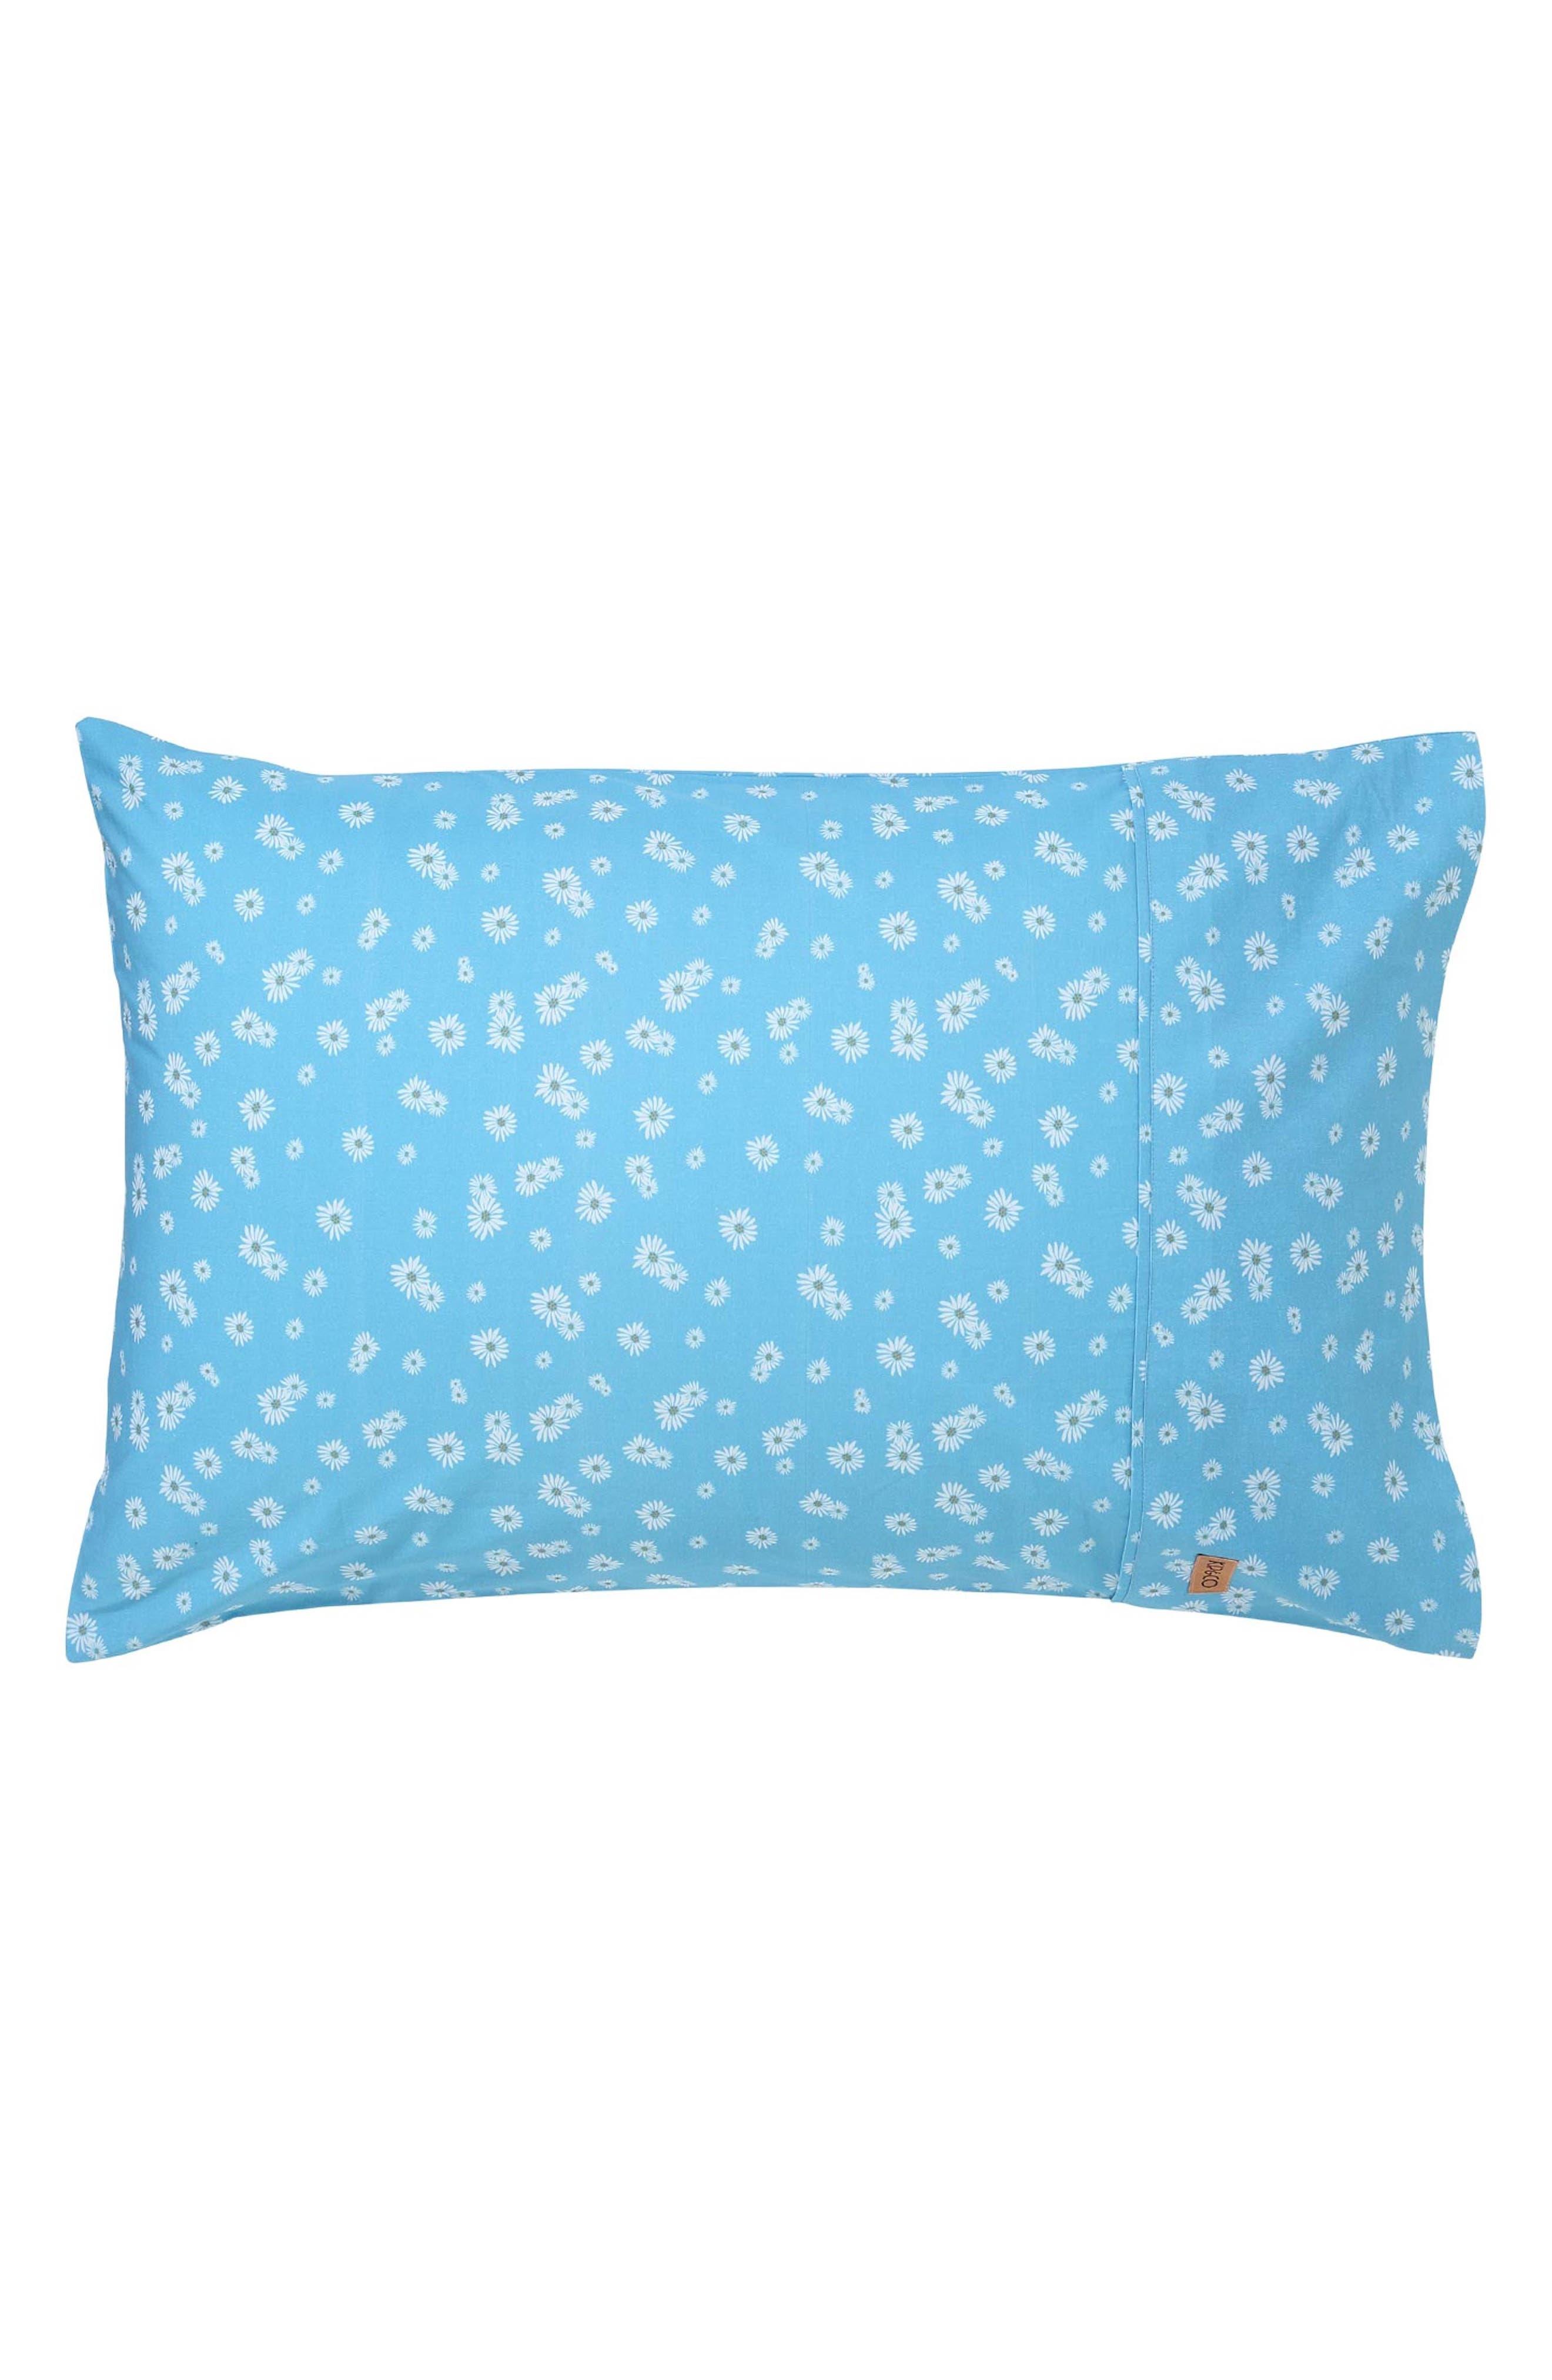 Lazy Daisy Cotton Pillowcase, Main, color, MULTI